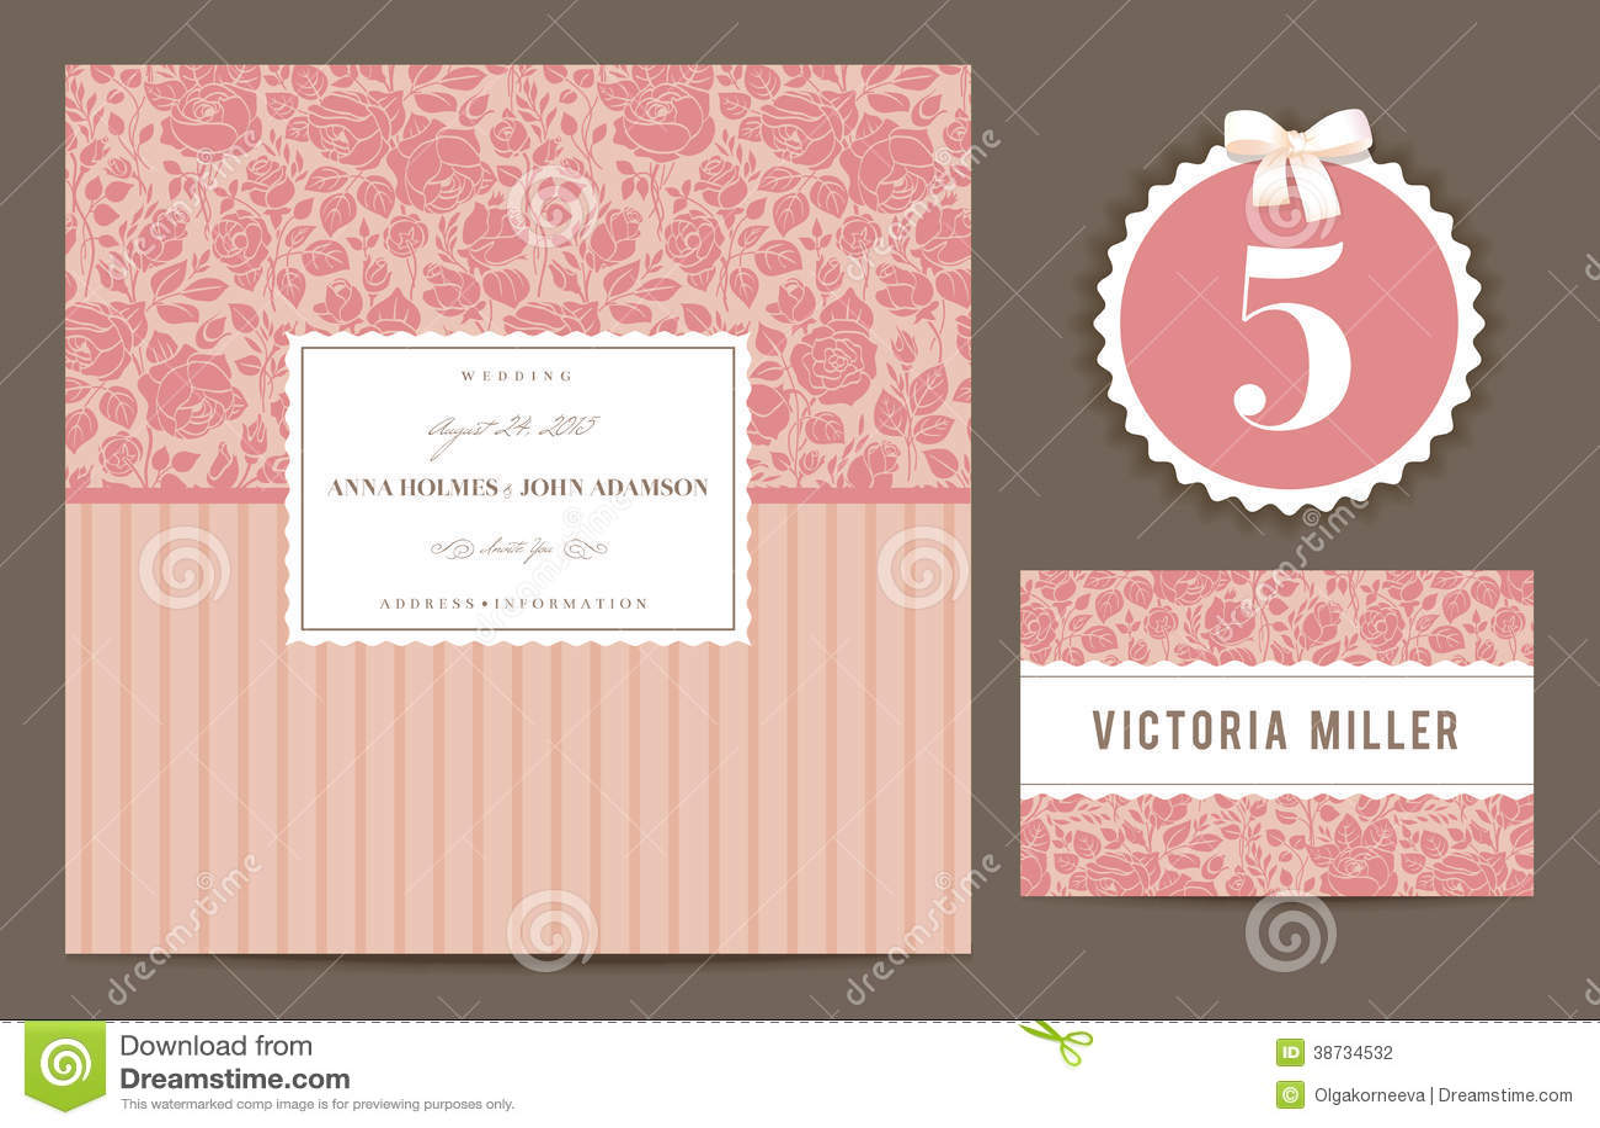 Coral Wedding Invitation was great invitation layout